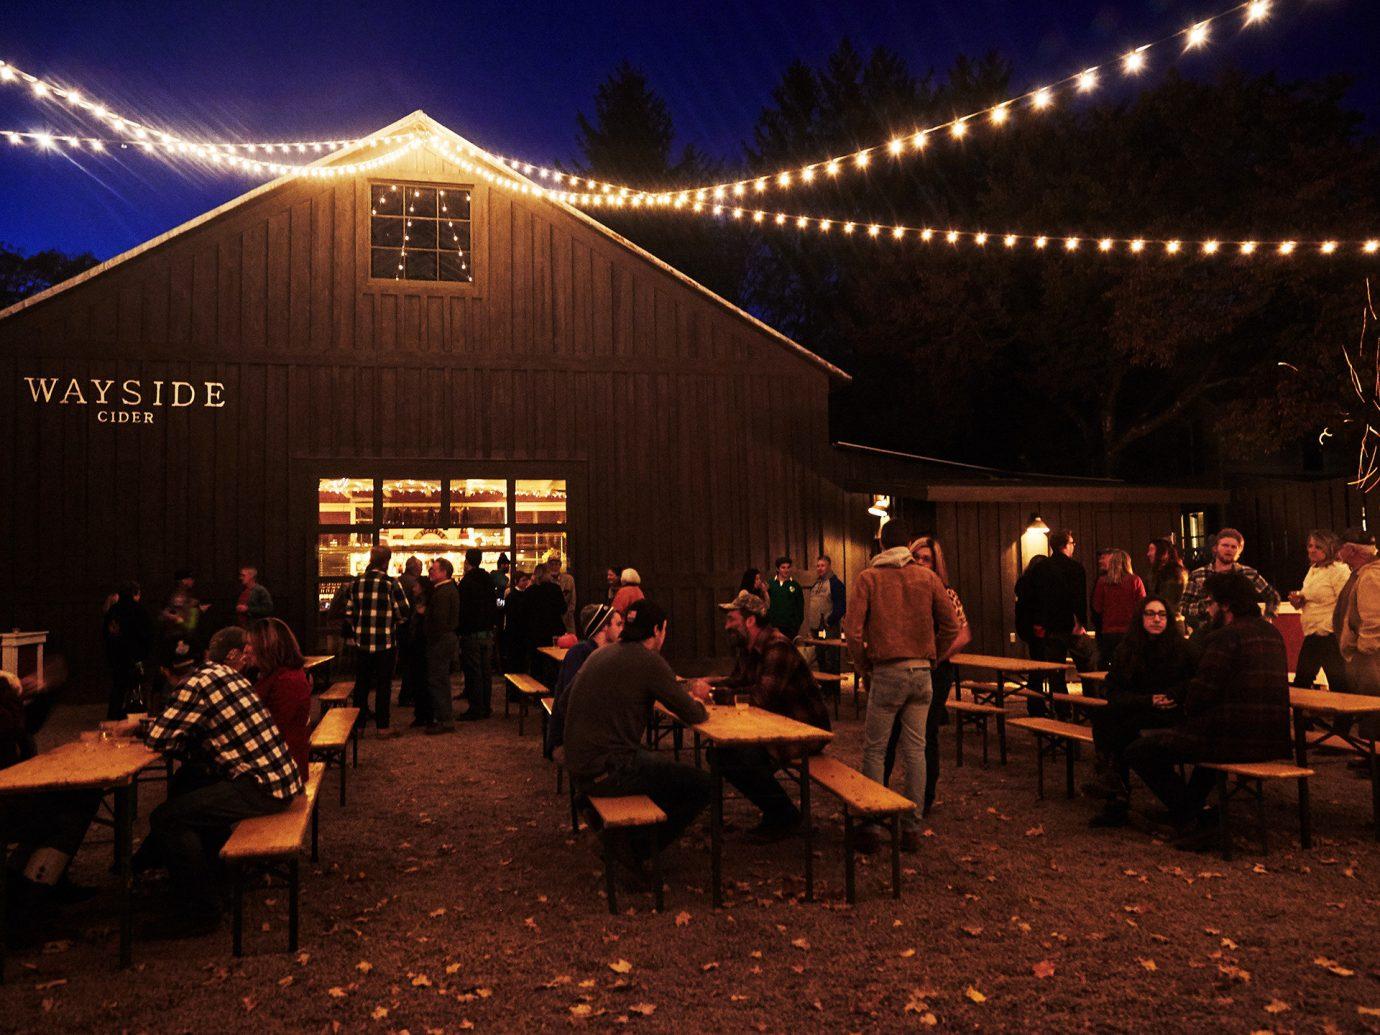 Romance Trip Ideas Weekend Getaways night lighting evening restaurant ceremony event darkness